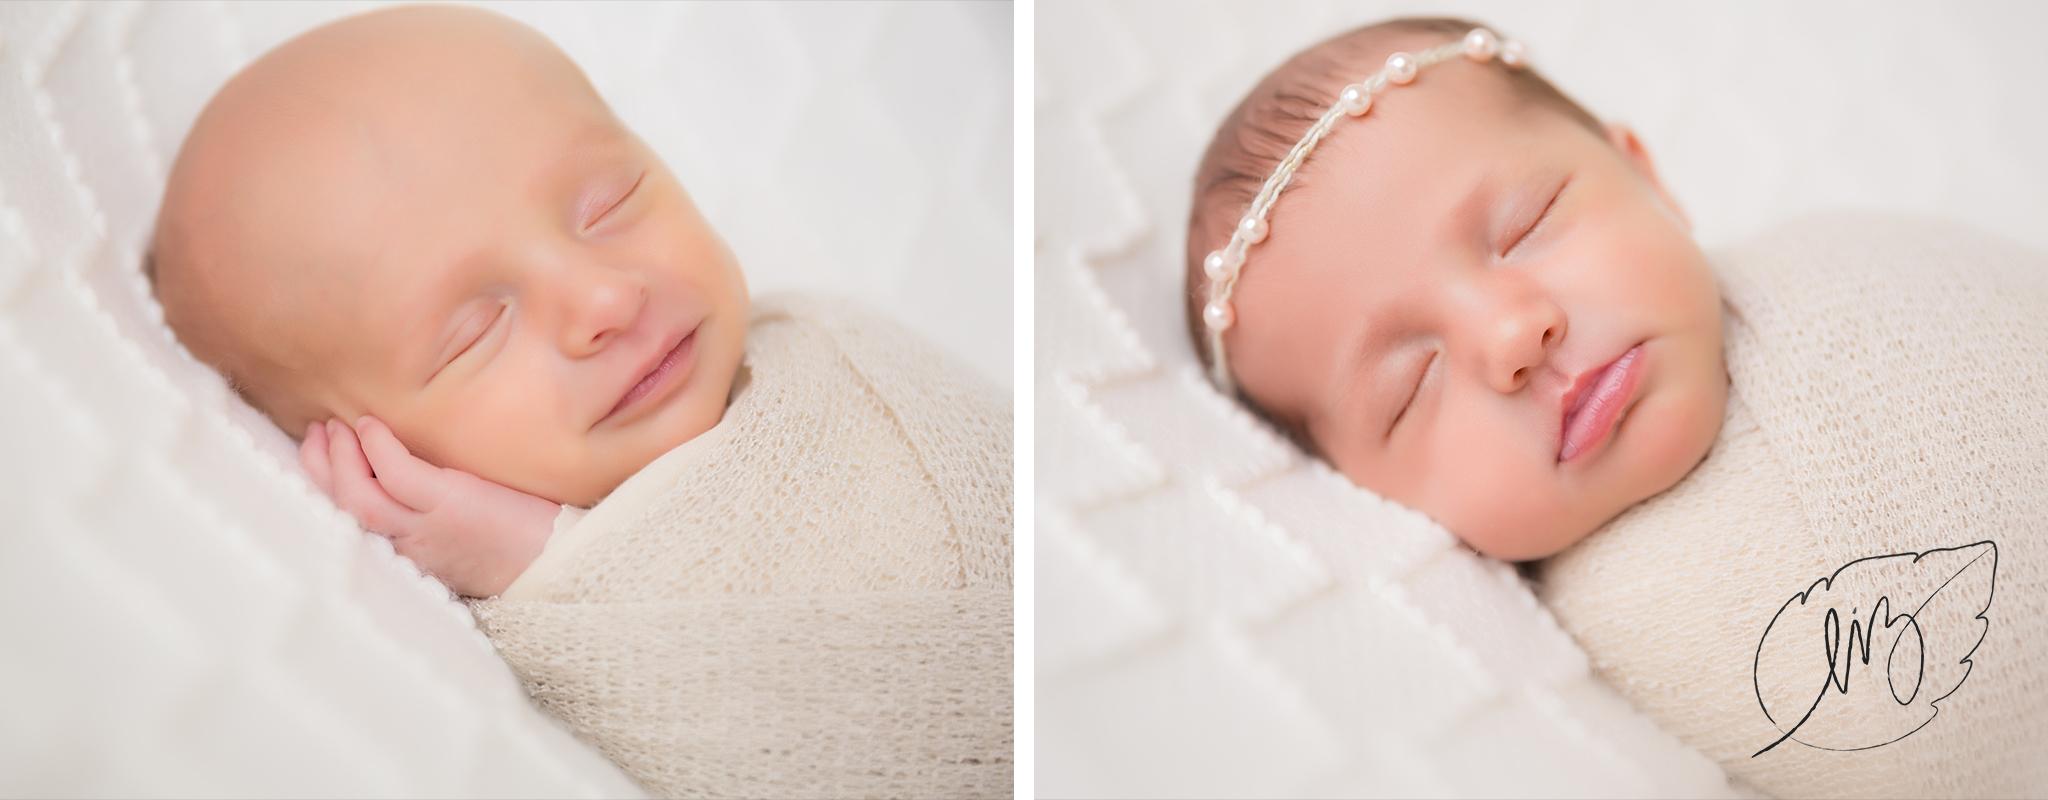 Inland_Empire_Newborn_Photographer_LizPricePhotography_02.jpg